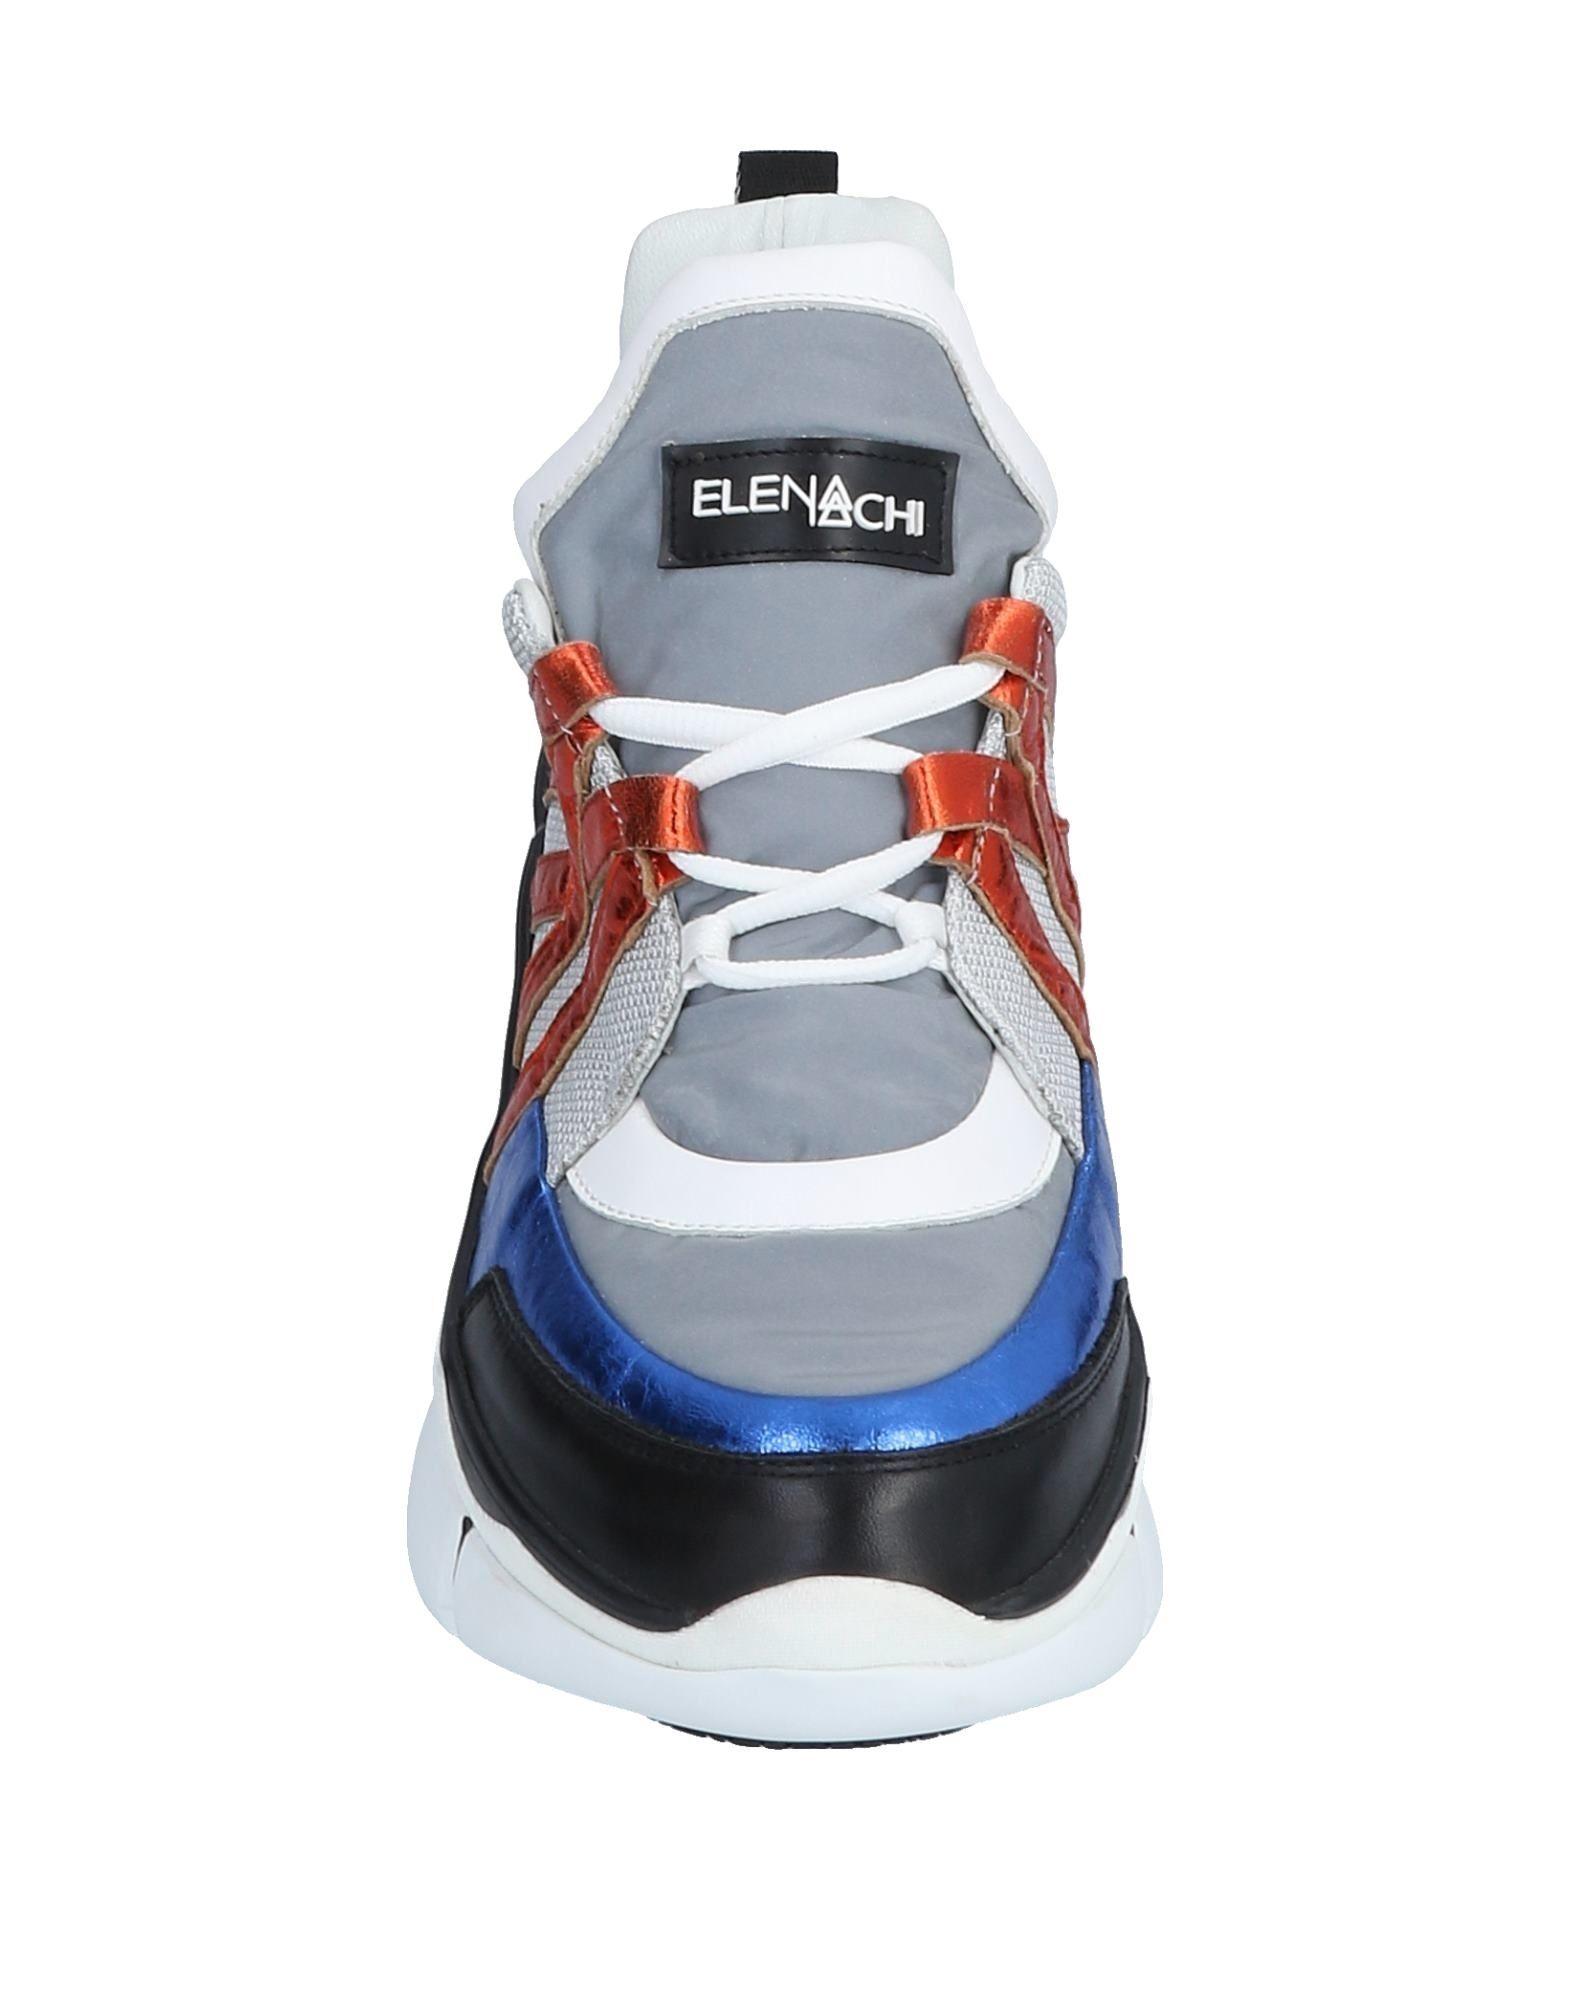 elena iachi baskets - femmes elena en iachi baskets en elena ligne sur canada - 11581612ov c91f61